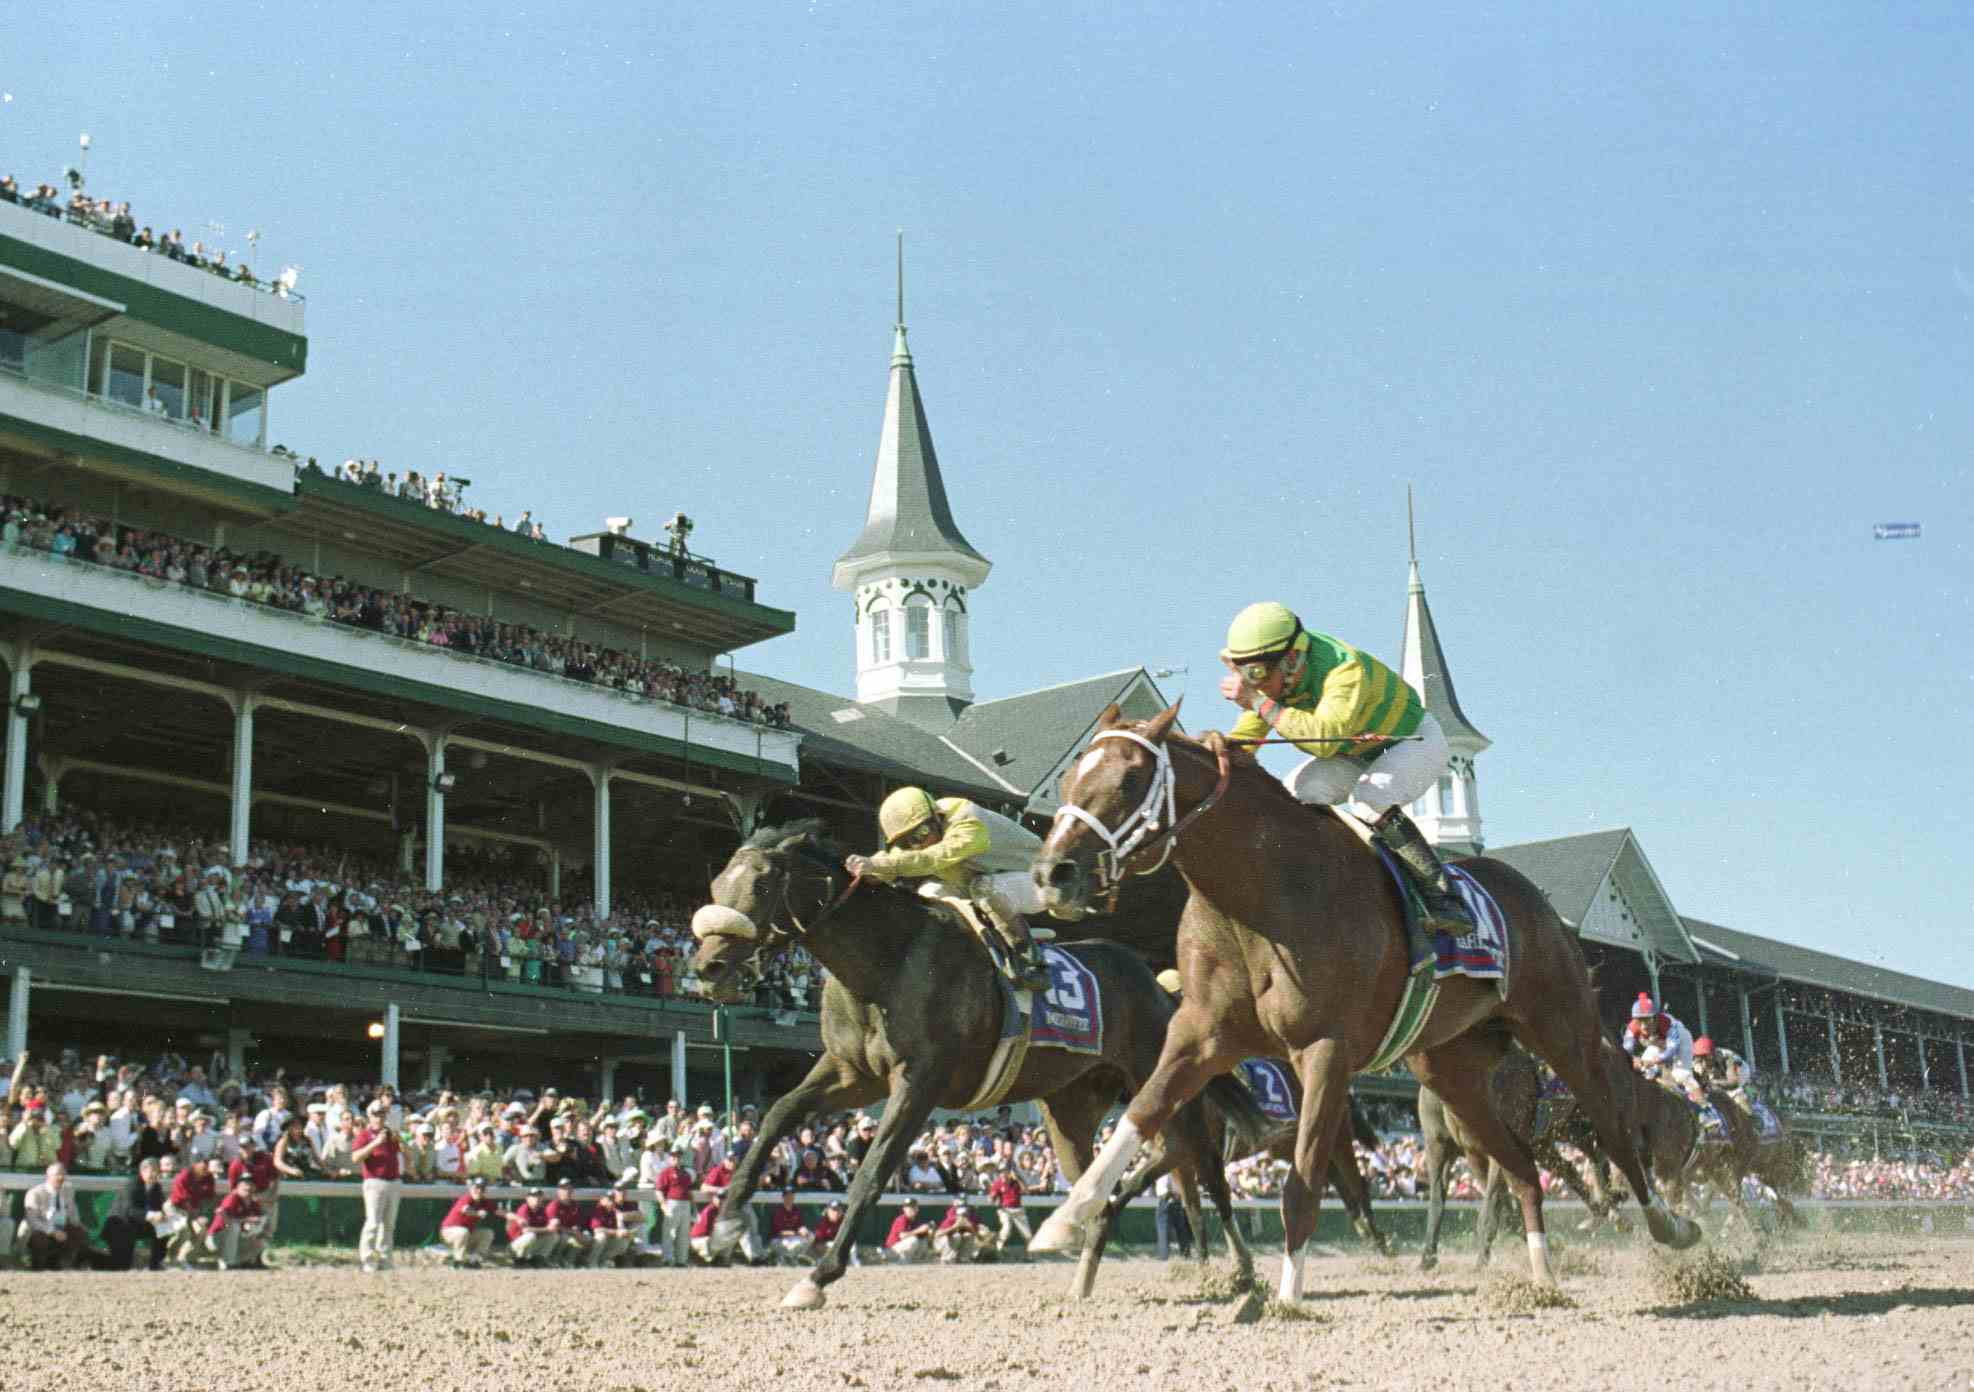 Kentucky Derby horse Charismatic